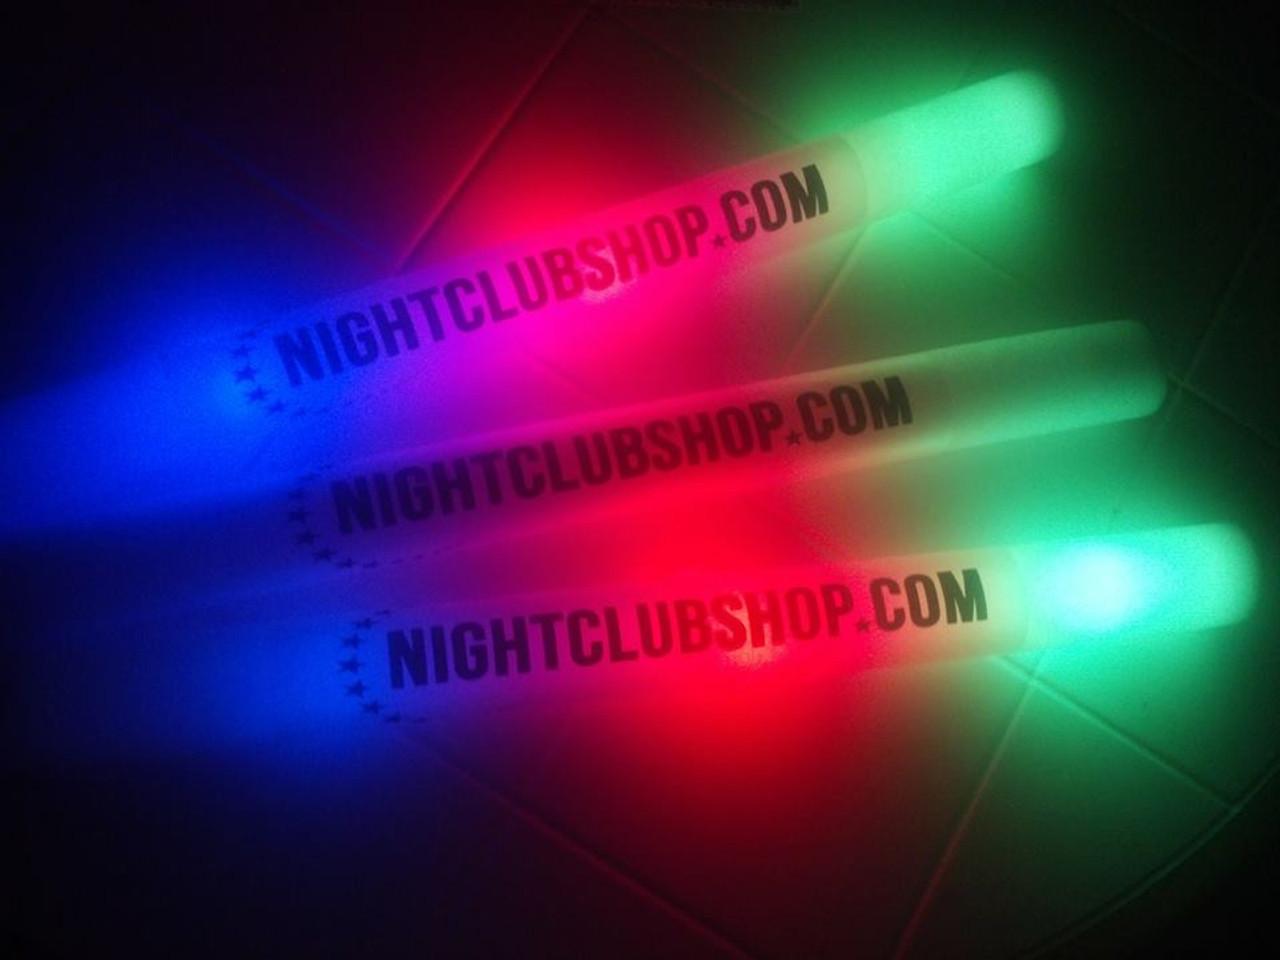 LED FOAM STICK, Led, Foam, Stick, Baton, Lumiton, Glow, Electronic, Light, Stix, Rave, EDM, Palito, Palo, UV, Illuminate, luminoso, luz, Electro, stic, FoamStick, LEDFOAMSTICK,